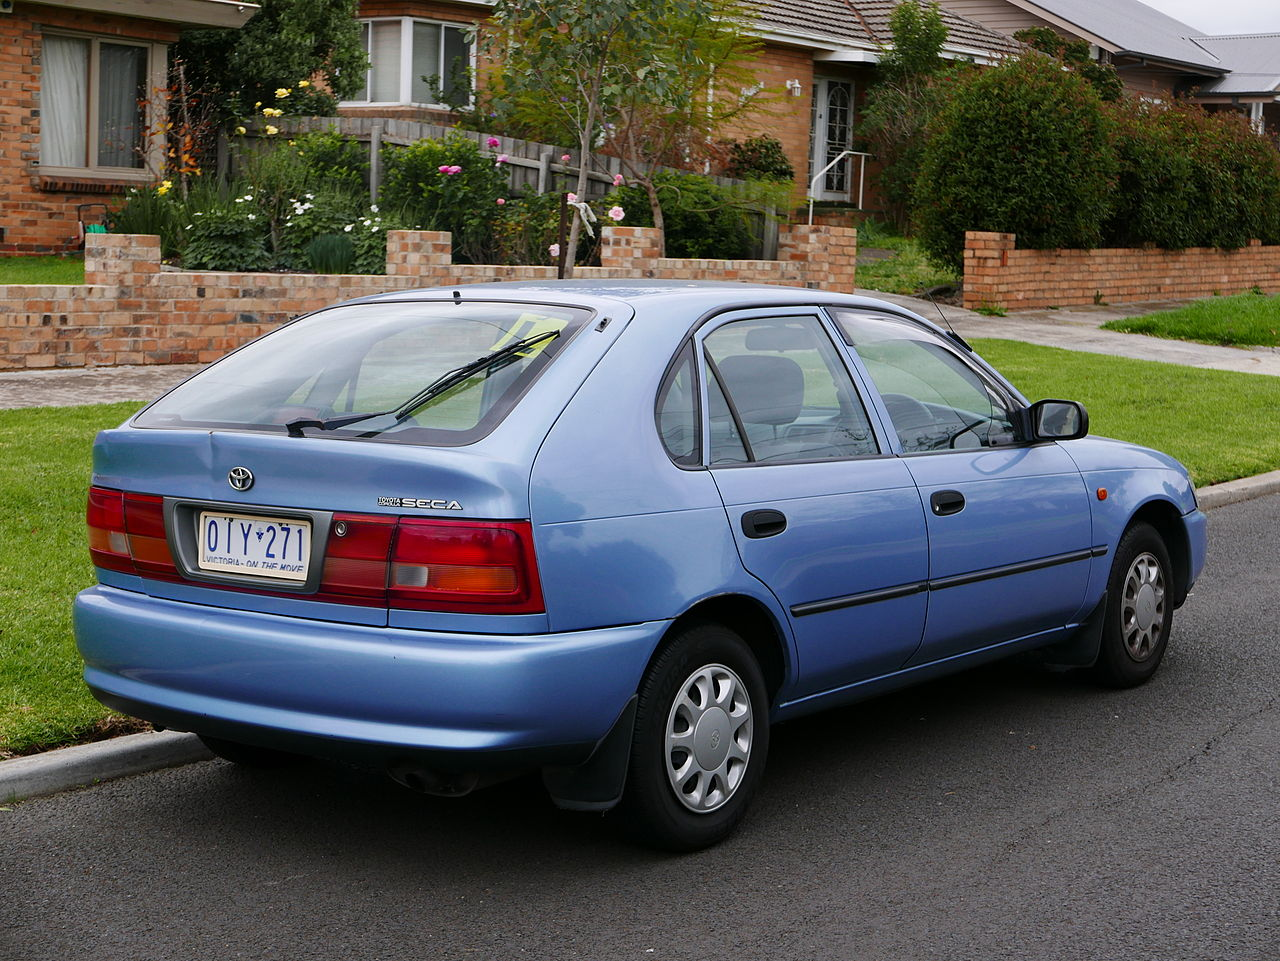 1997 Toyota Corolla 5 Doors